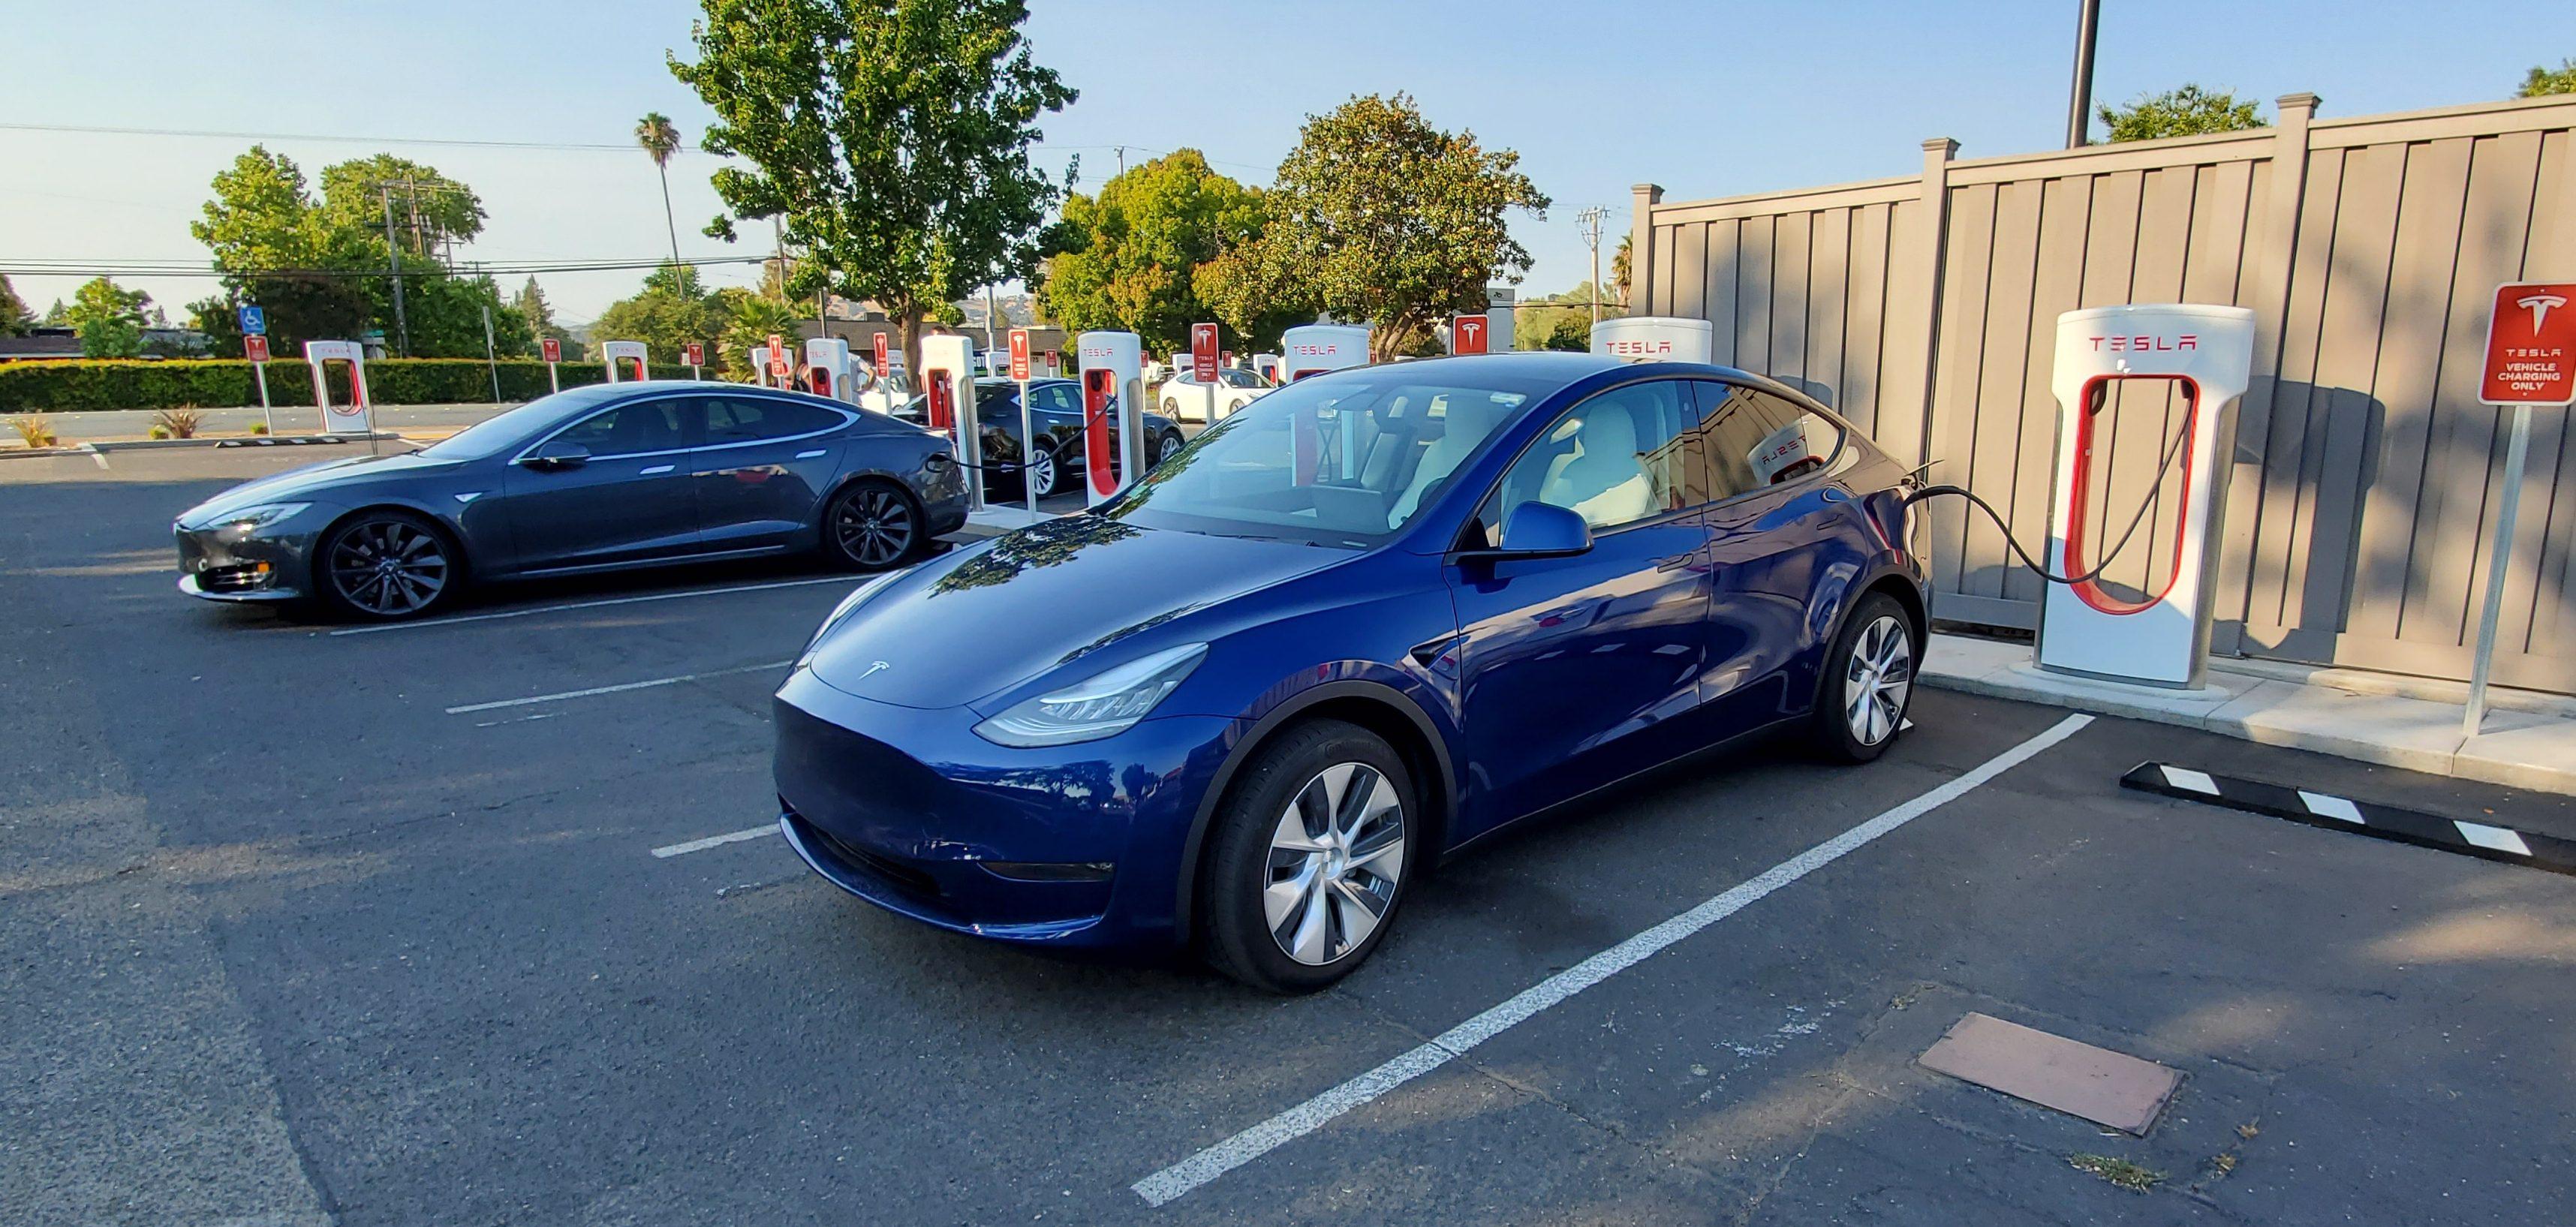 Tesla Model Y hero 6 e1596335195278 jpg?quality=82&strip=all.'